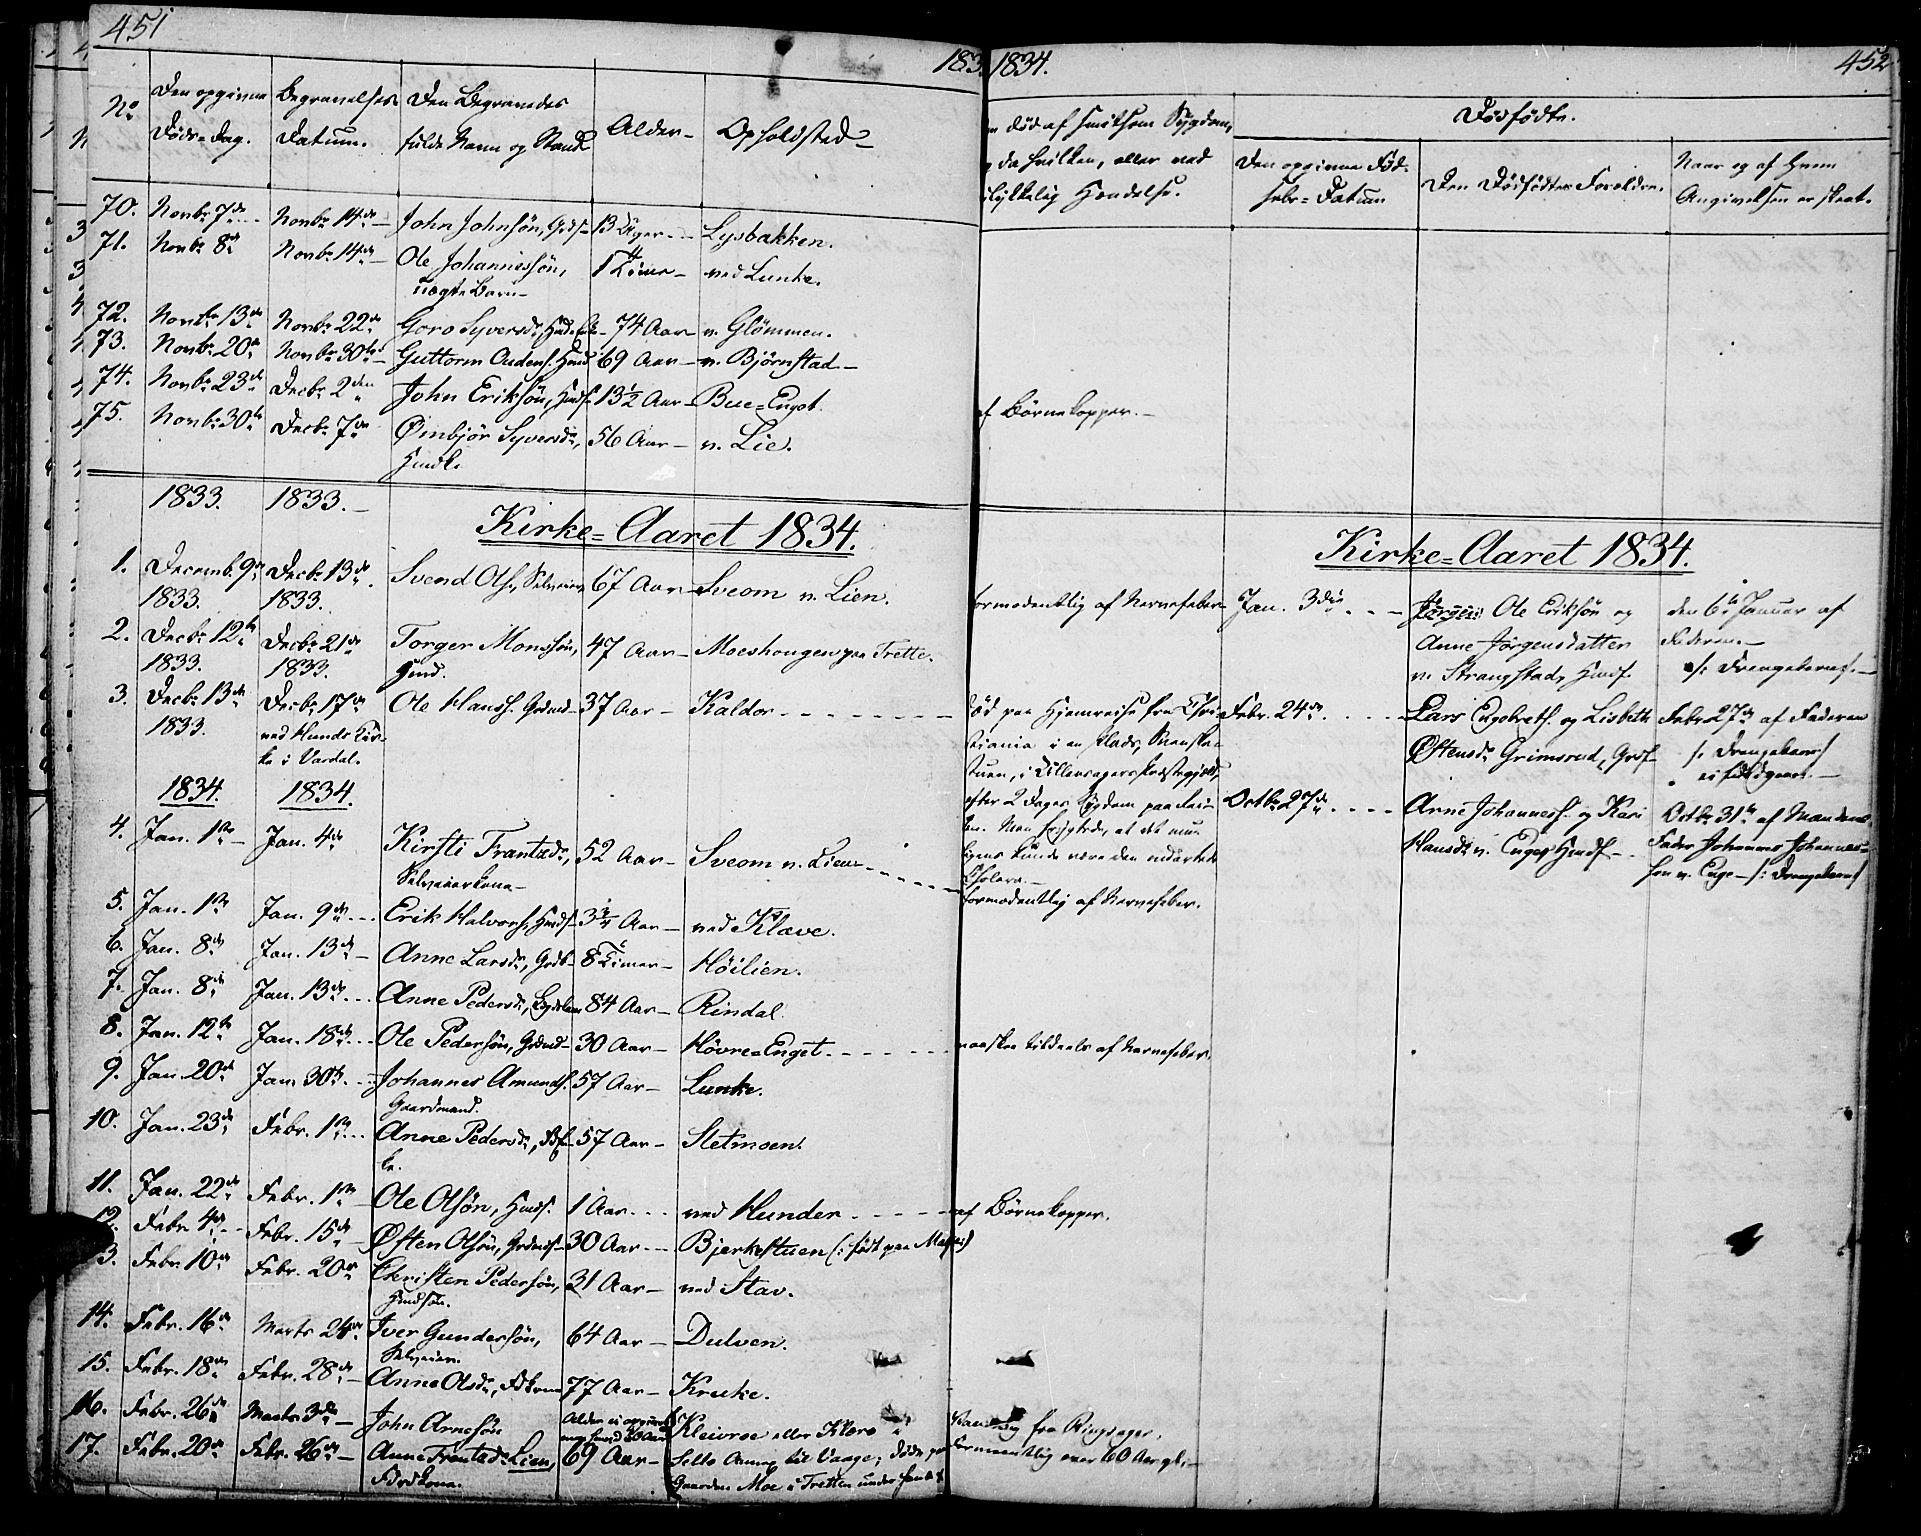 SAH, Øyer prestekontor, Ministerialbok nr. 4, 1824-1841, s. 451-452